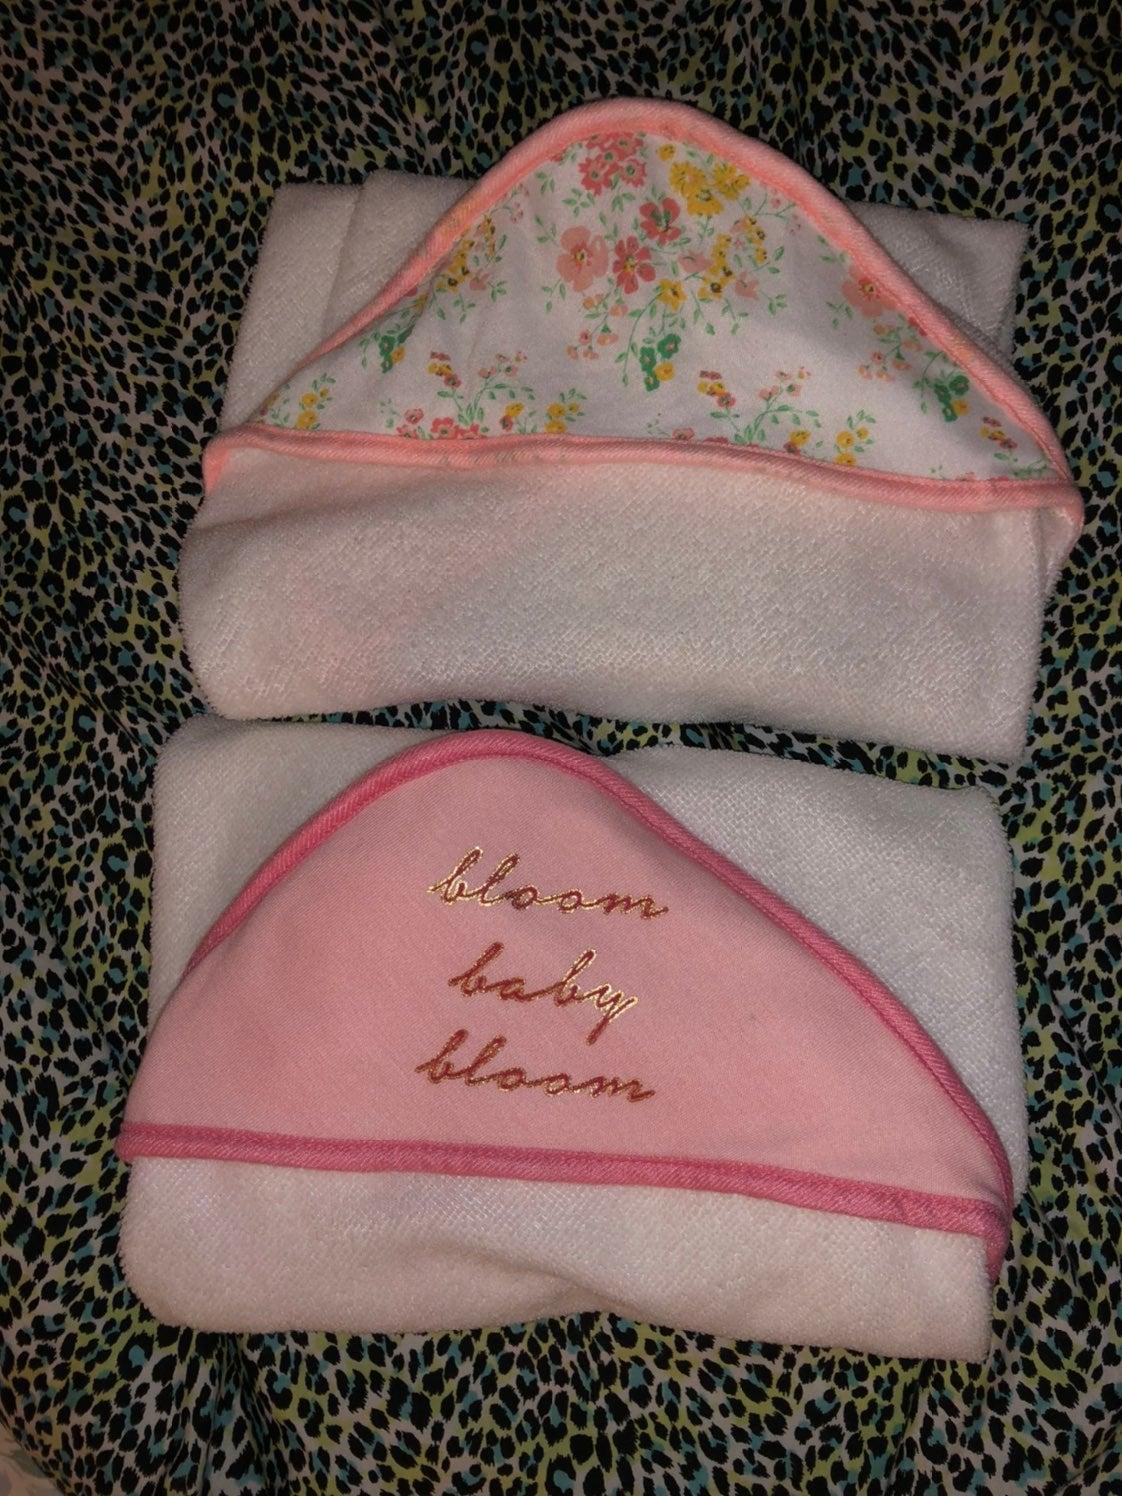 Baby girl hooded towels